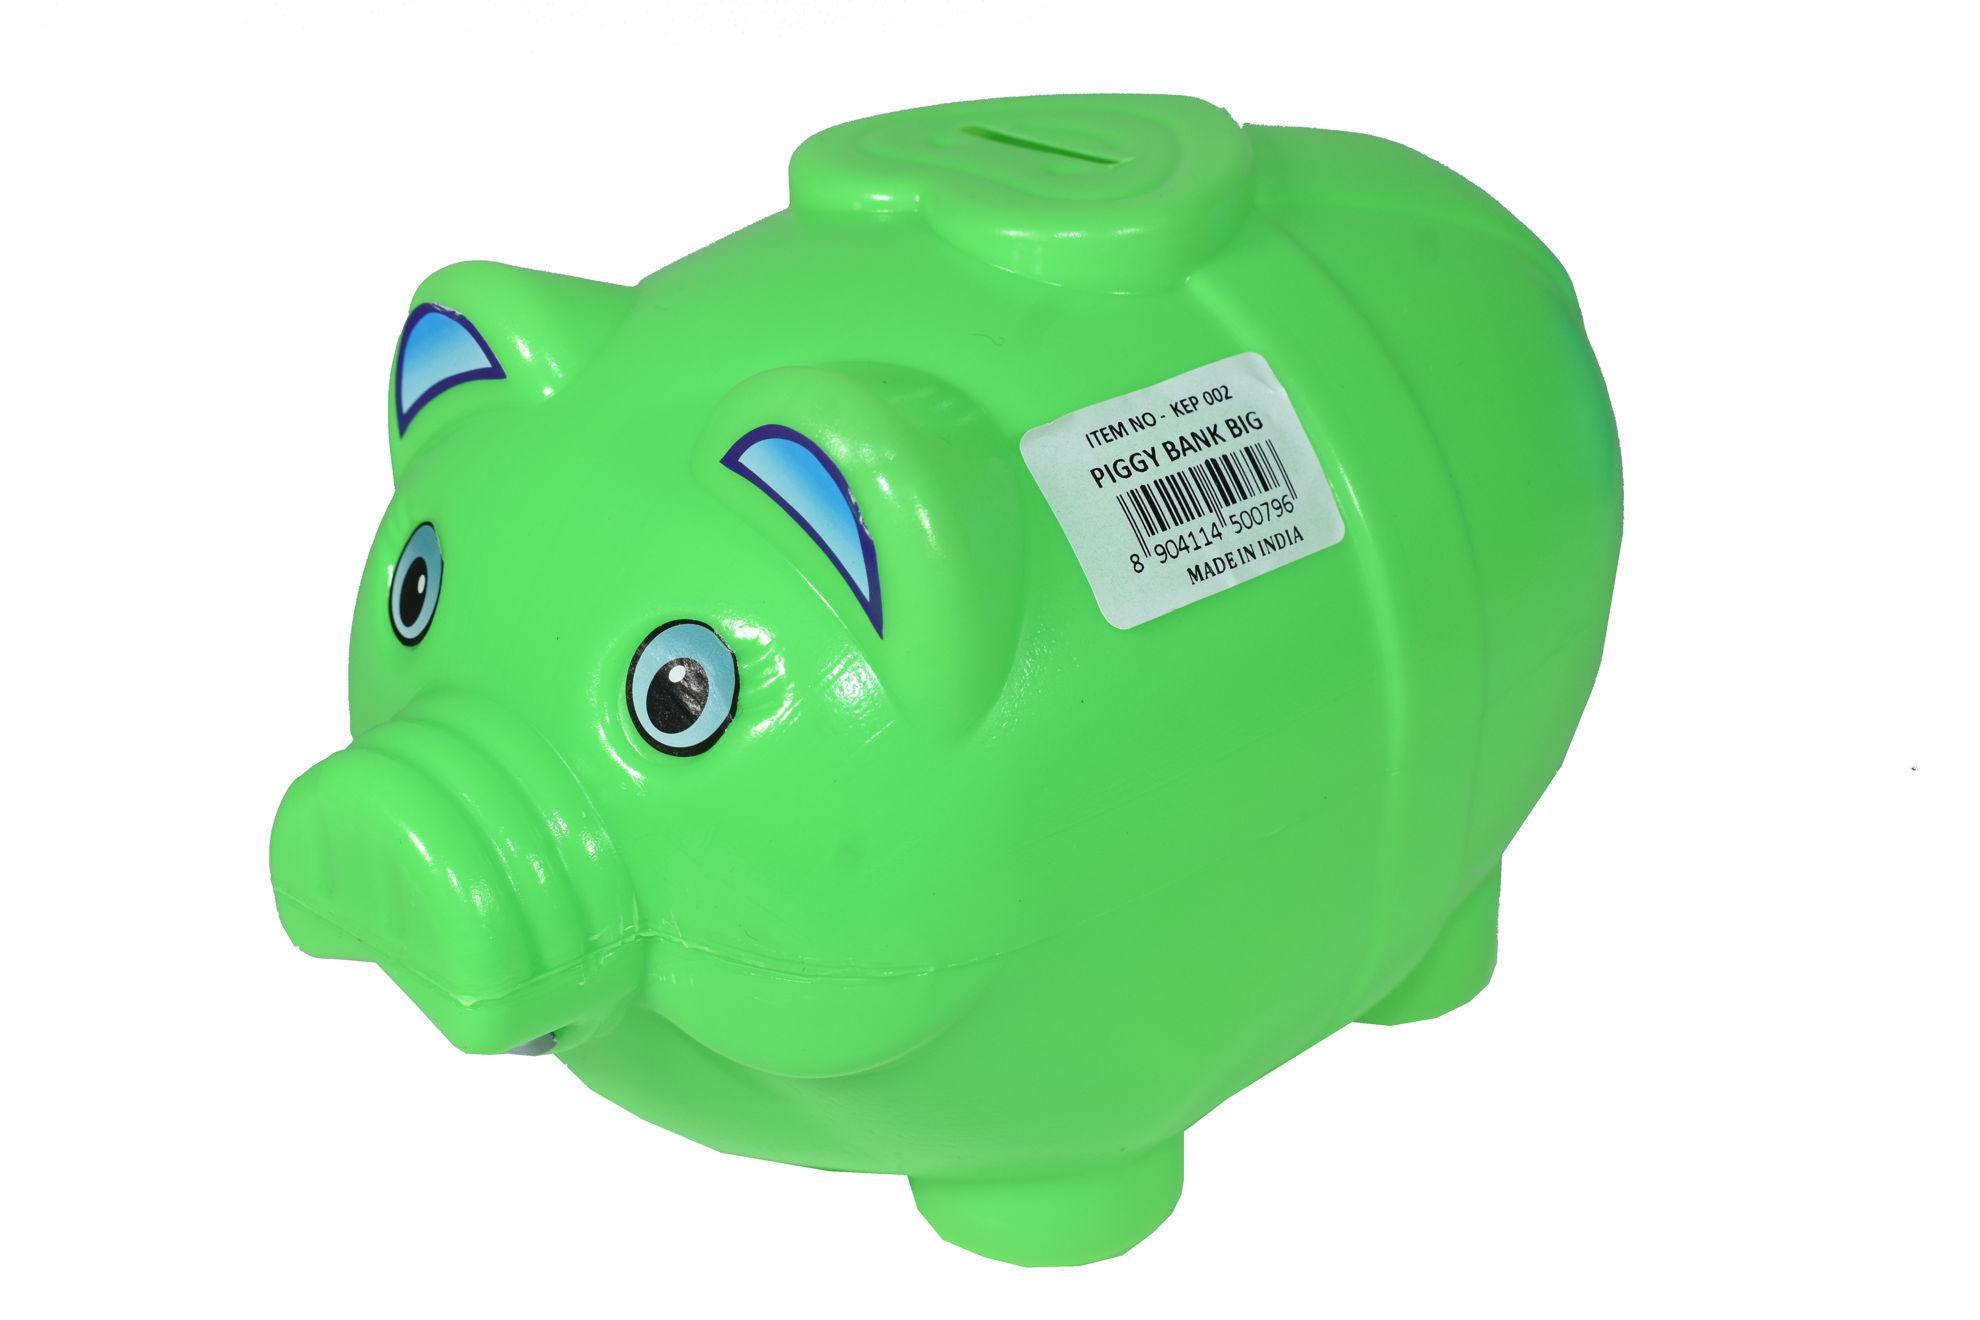 Foto de Alcancia chancho mediana KEP002 14x20cms corazon piggy bank small